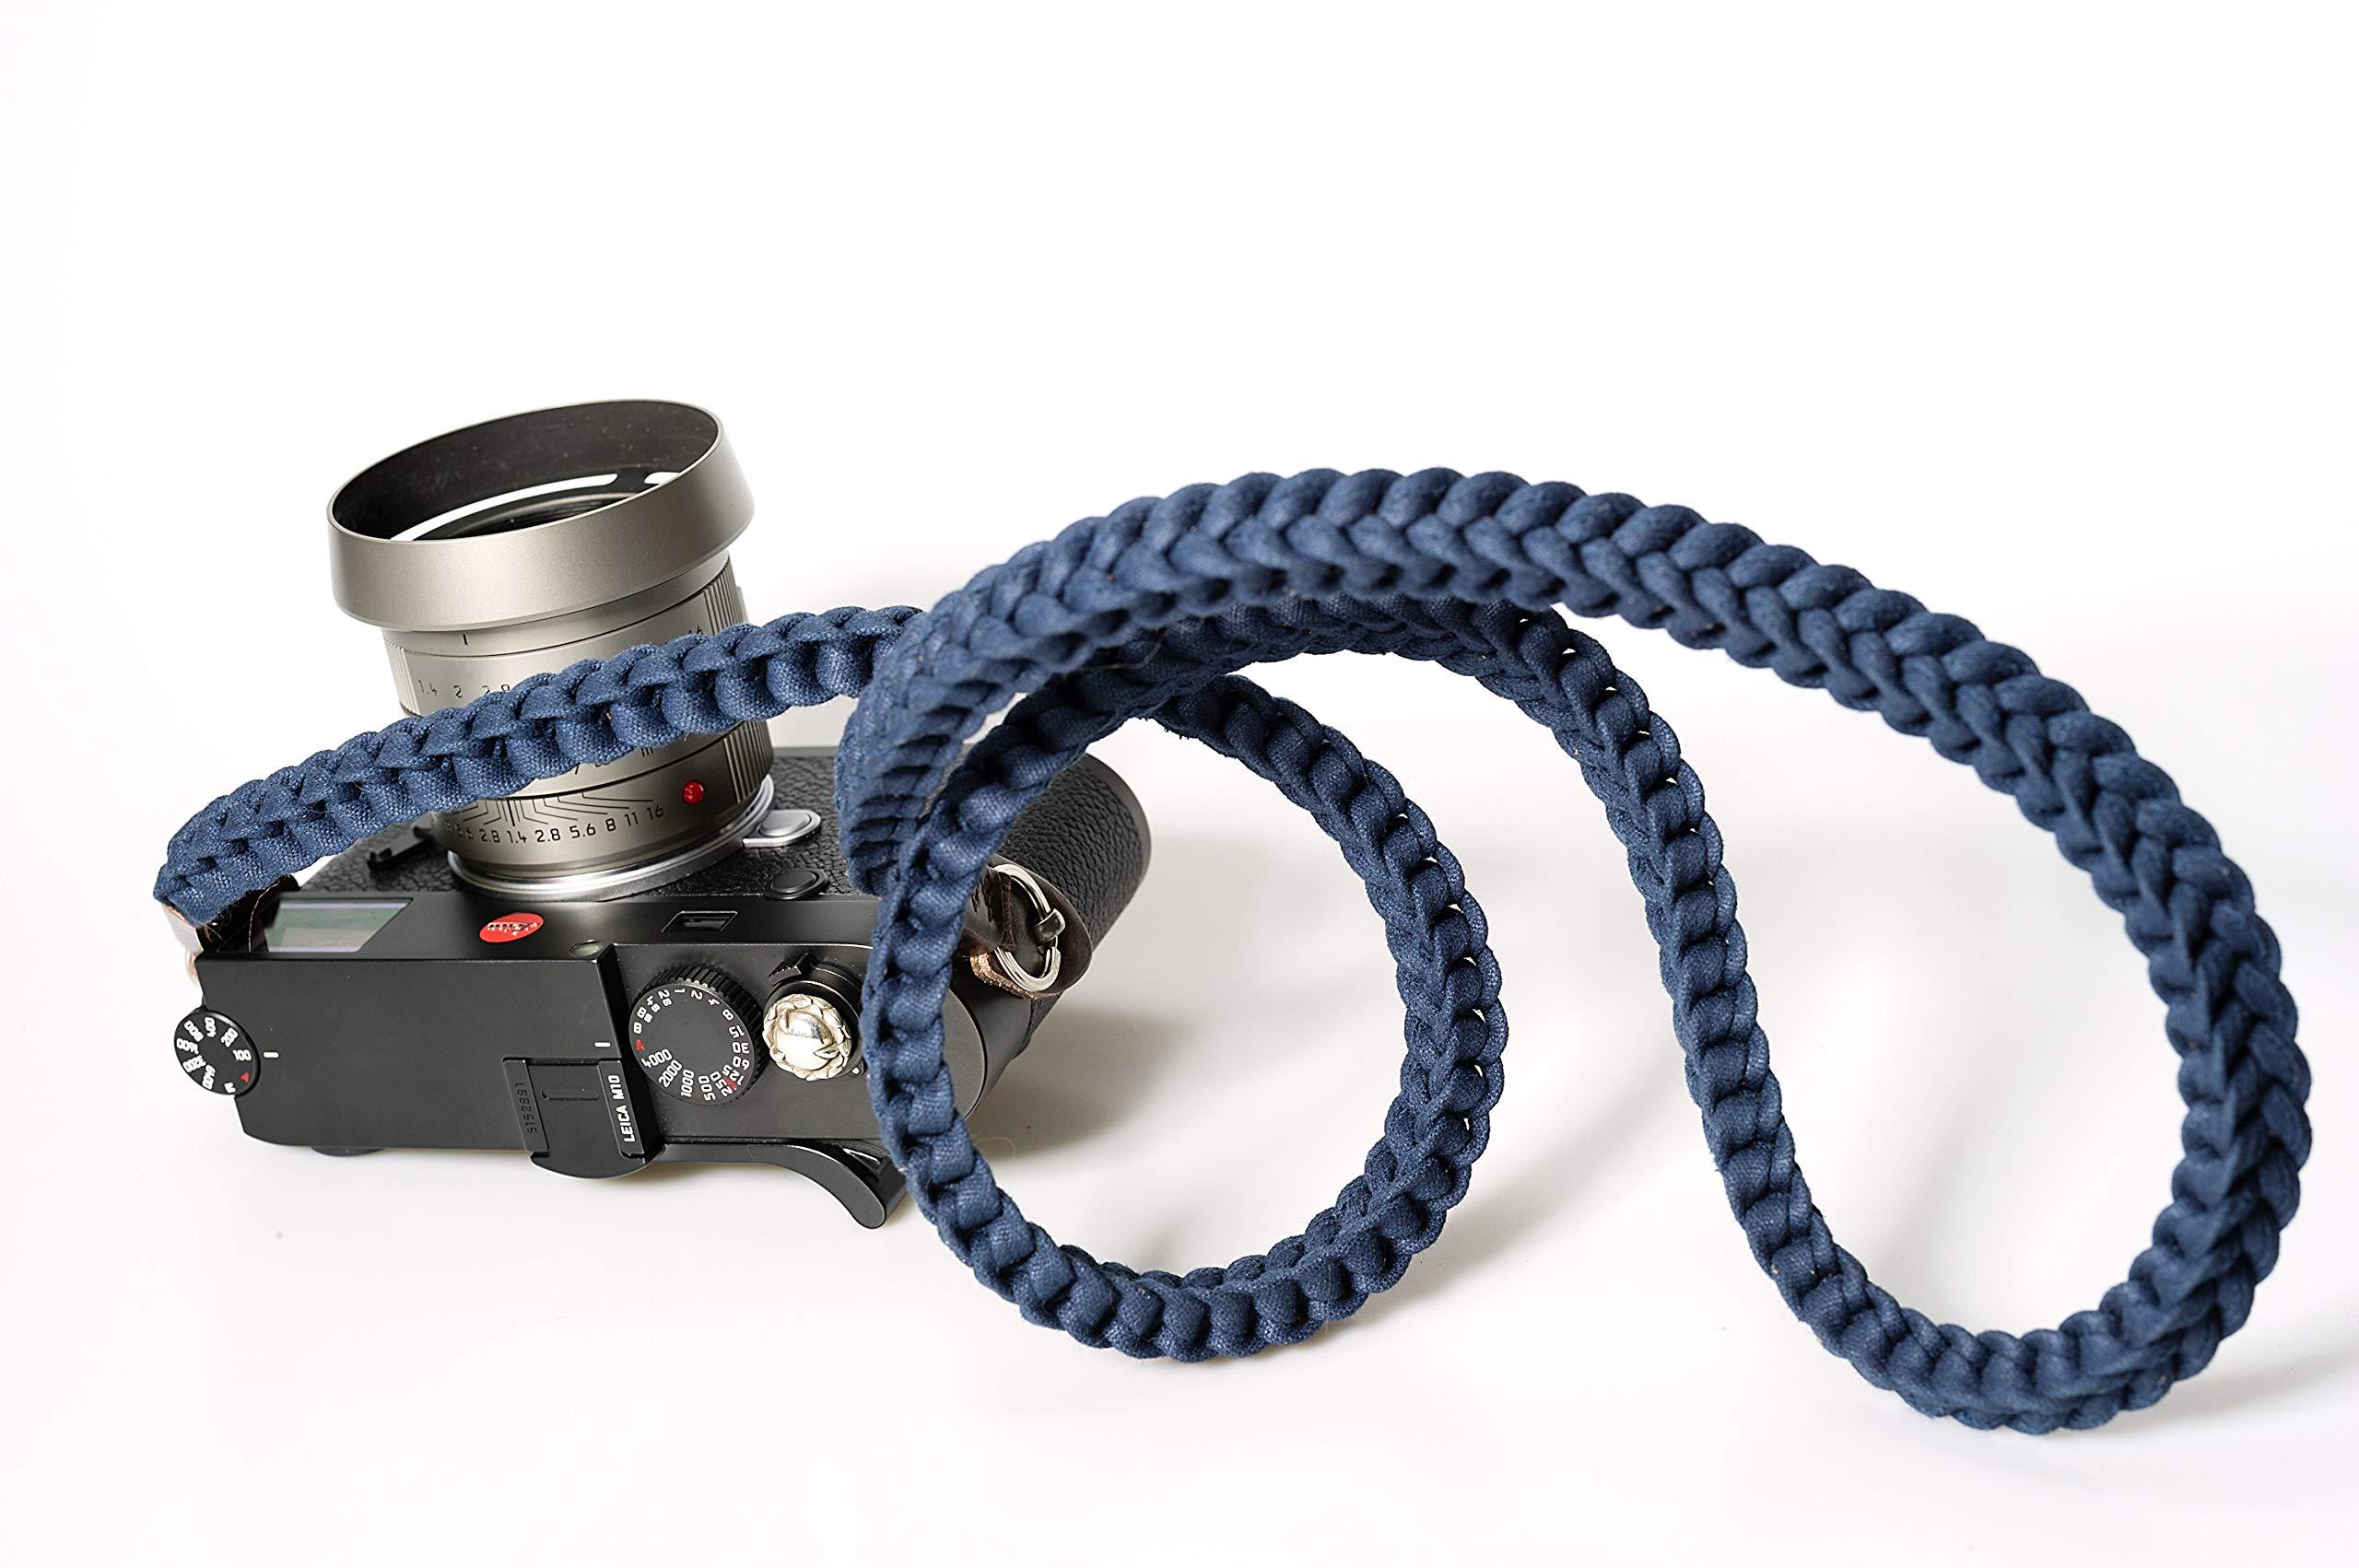 Barton 1972 Designer Braided Canvas Dark Blue Military Camera Neck Strap Lint Free Cotton 42'' Long w/Carry Bag Leica Sony Fuji Olympus Nikon